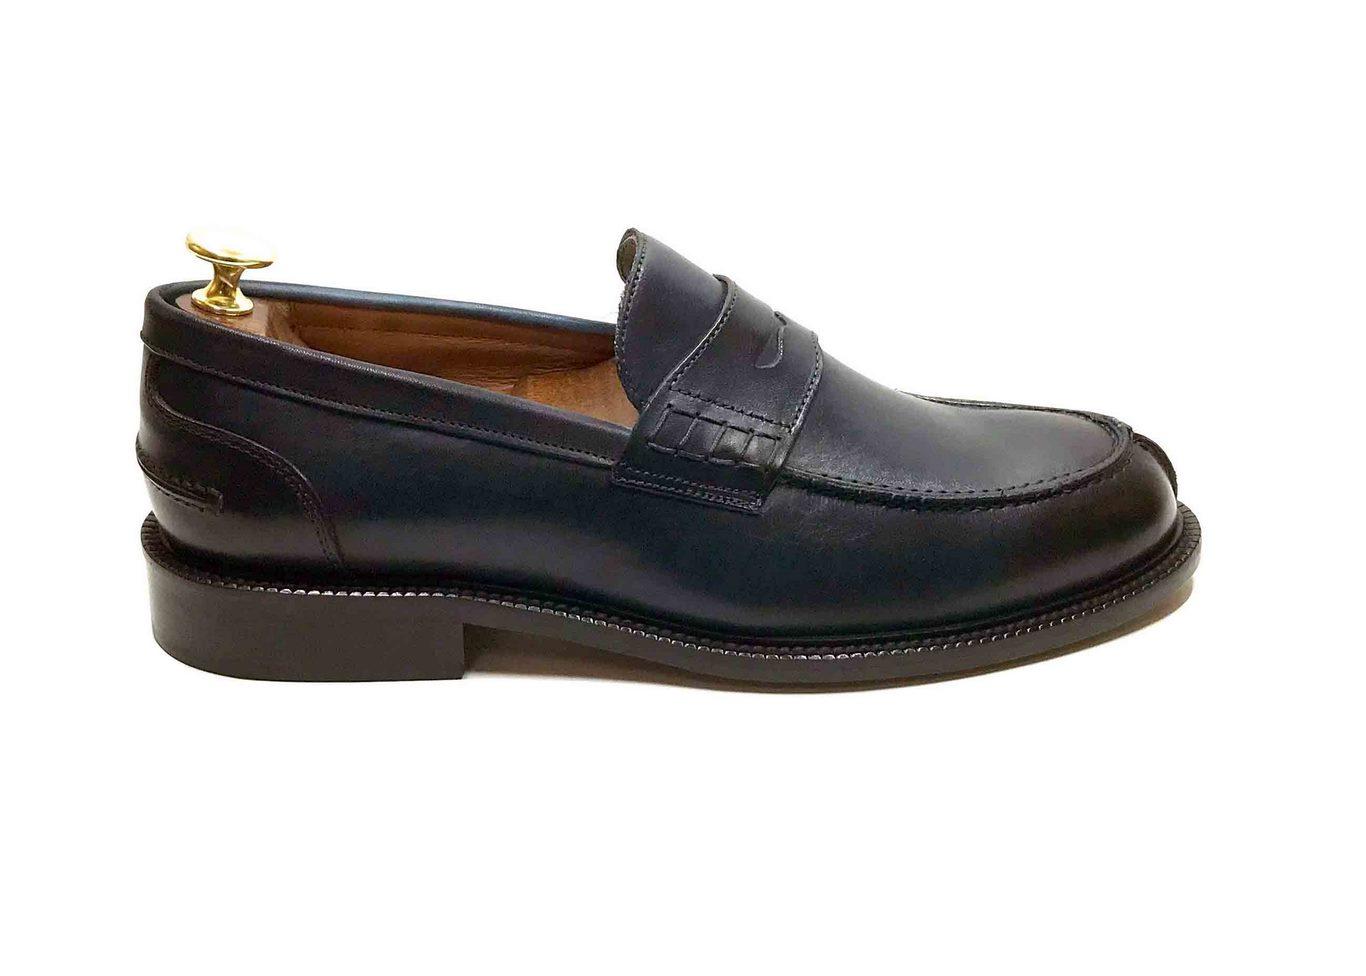 Penny loafer